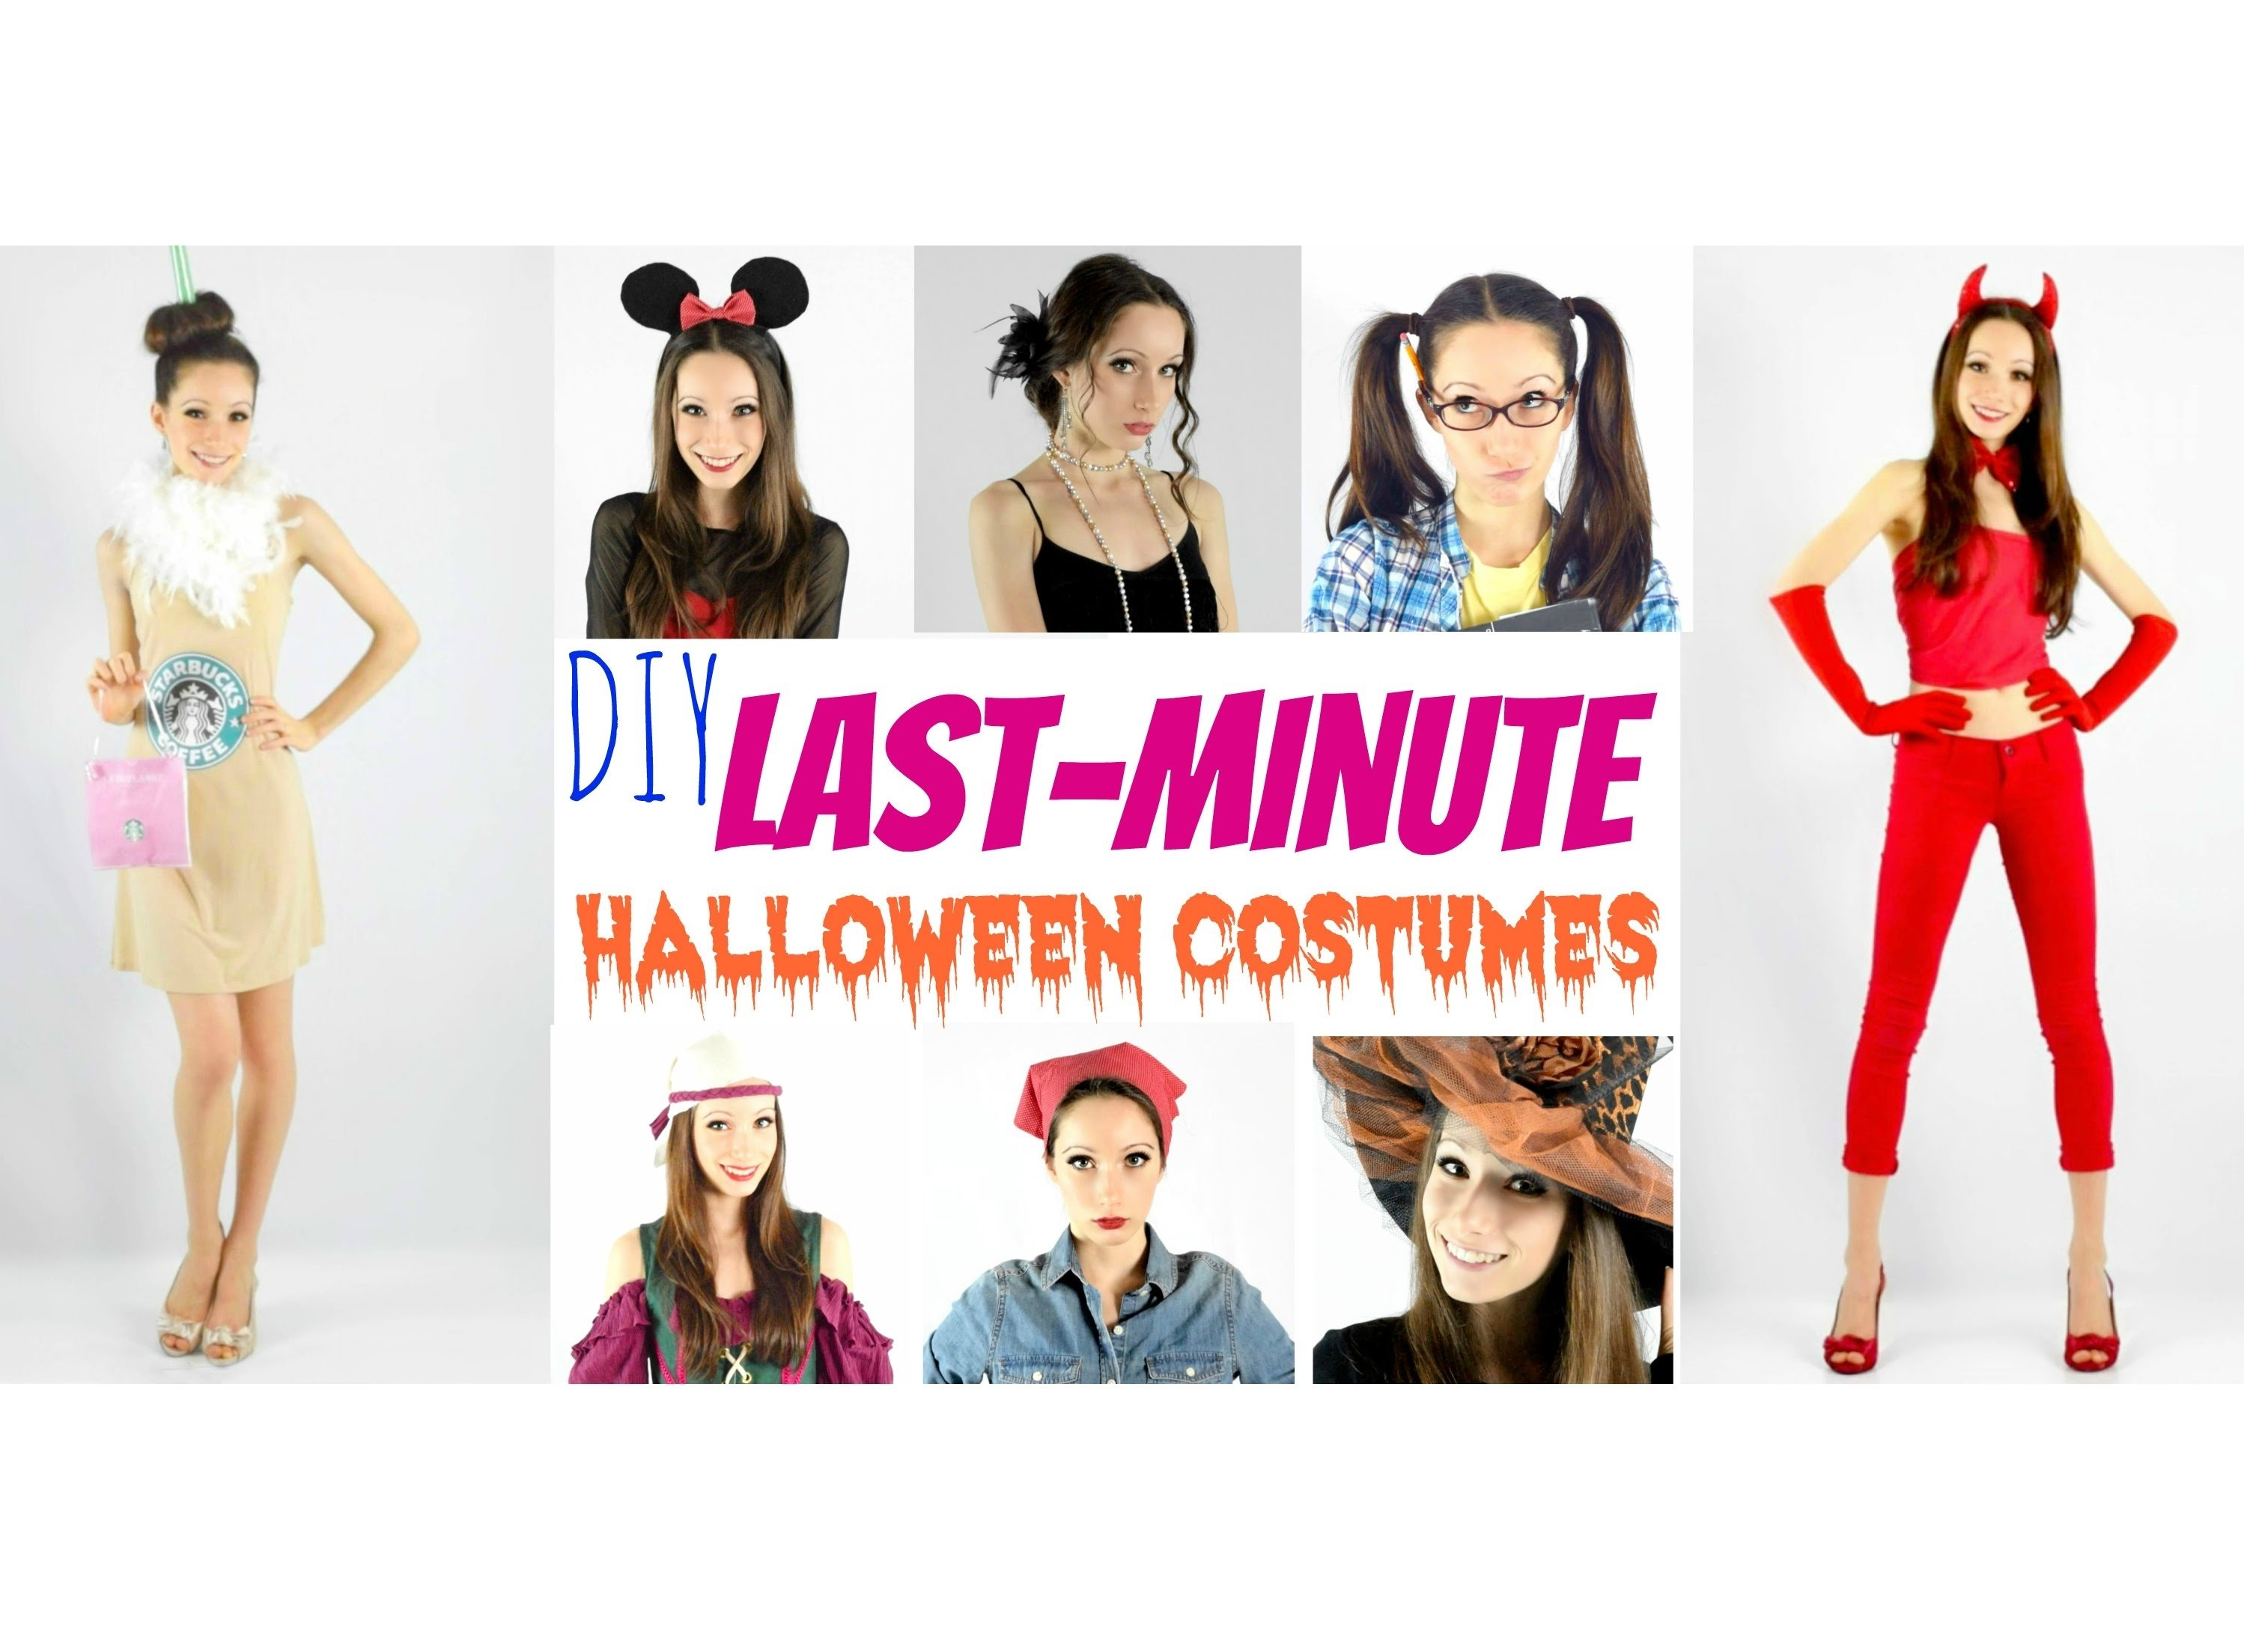 10 Elegant Quick Easy Halloween Costume Ideas 15 diy halloween costumes 3 2021